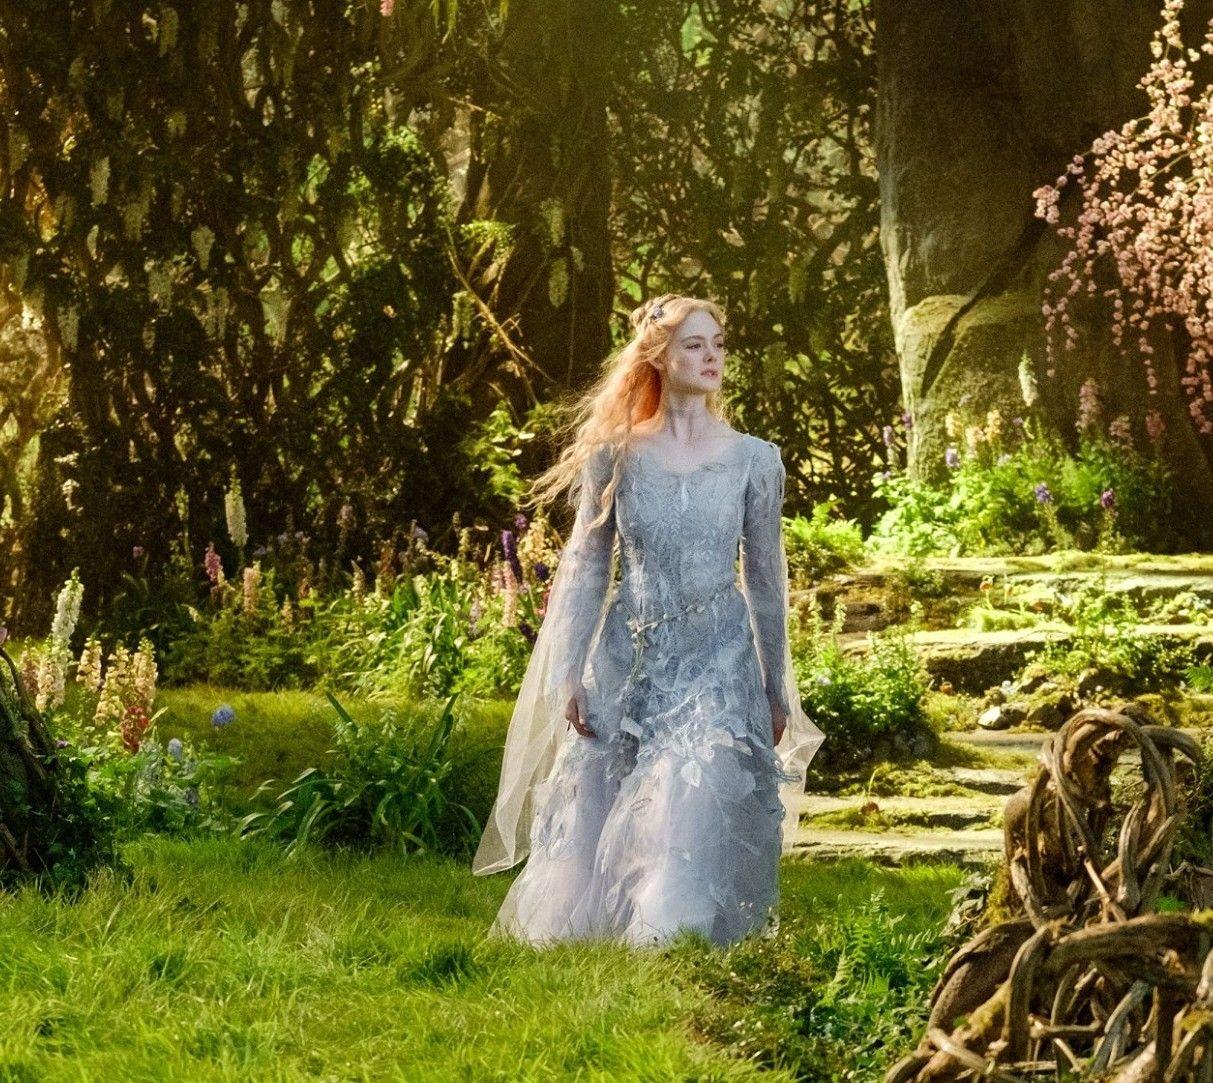 Elle fanning as princess aurora in maleficent mistress of